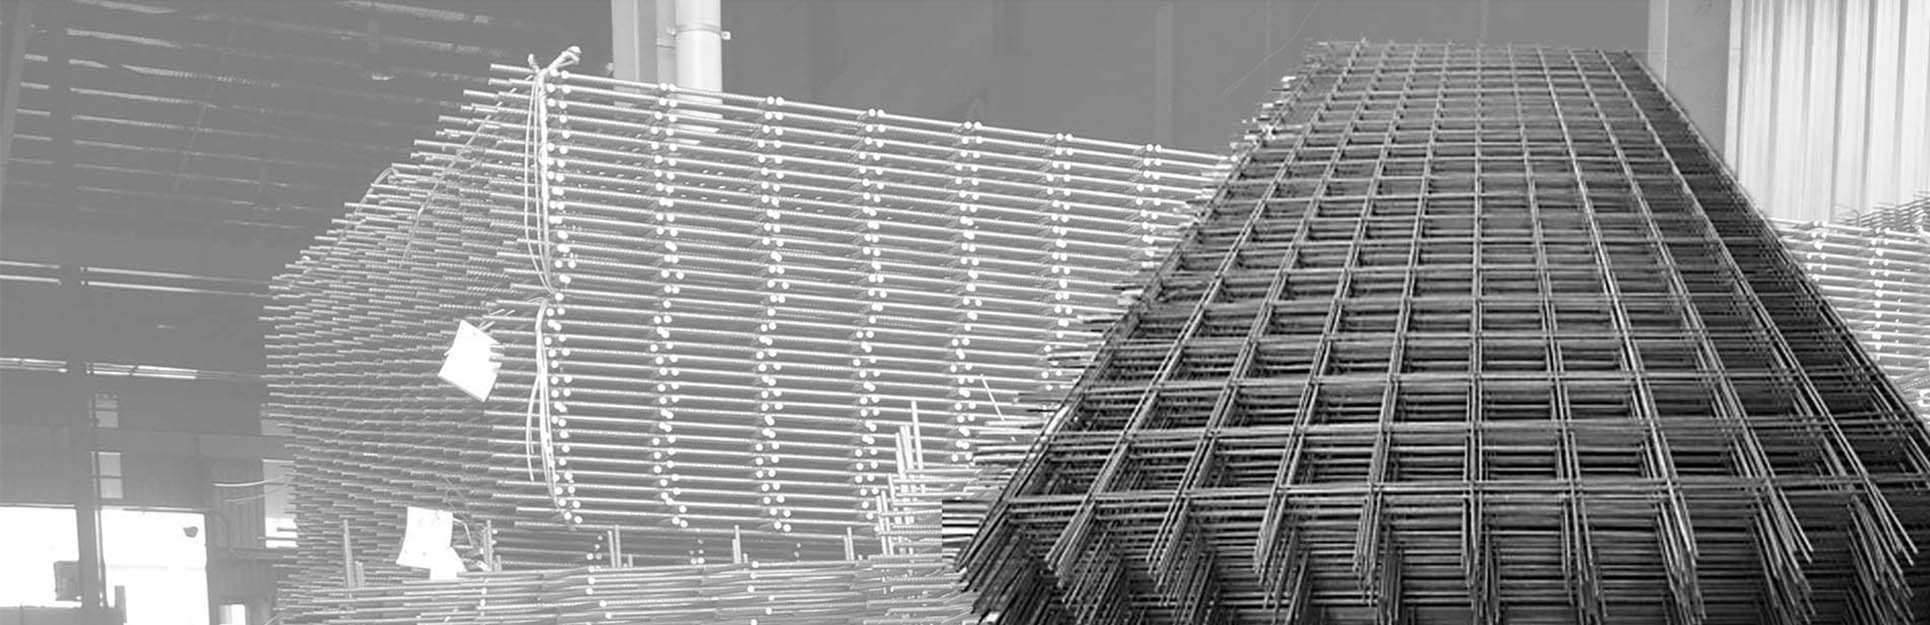 Australia reinforcing wire mesh reo